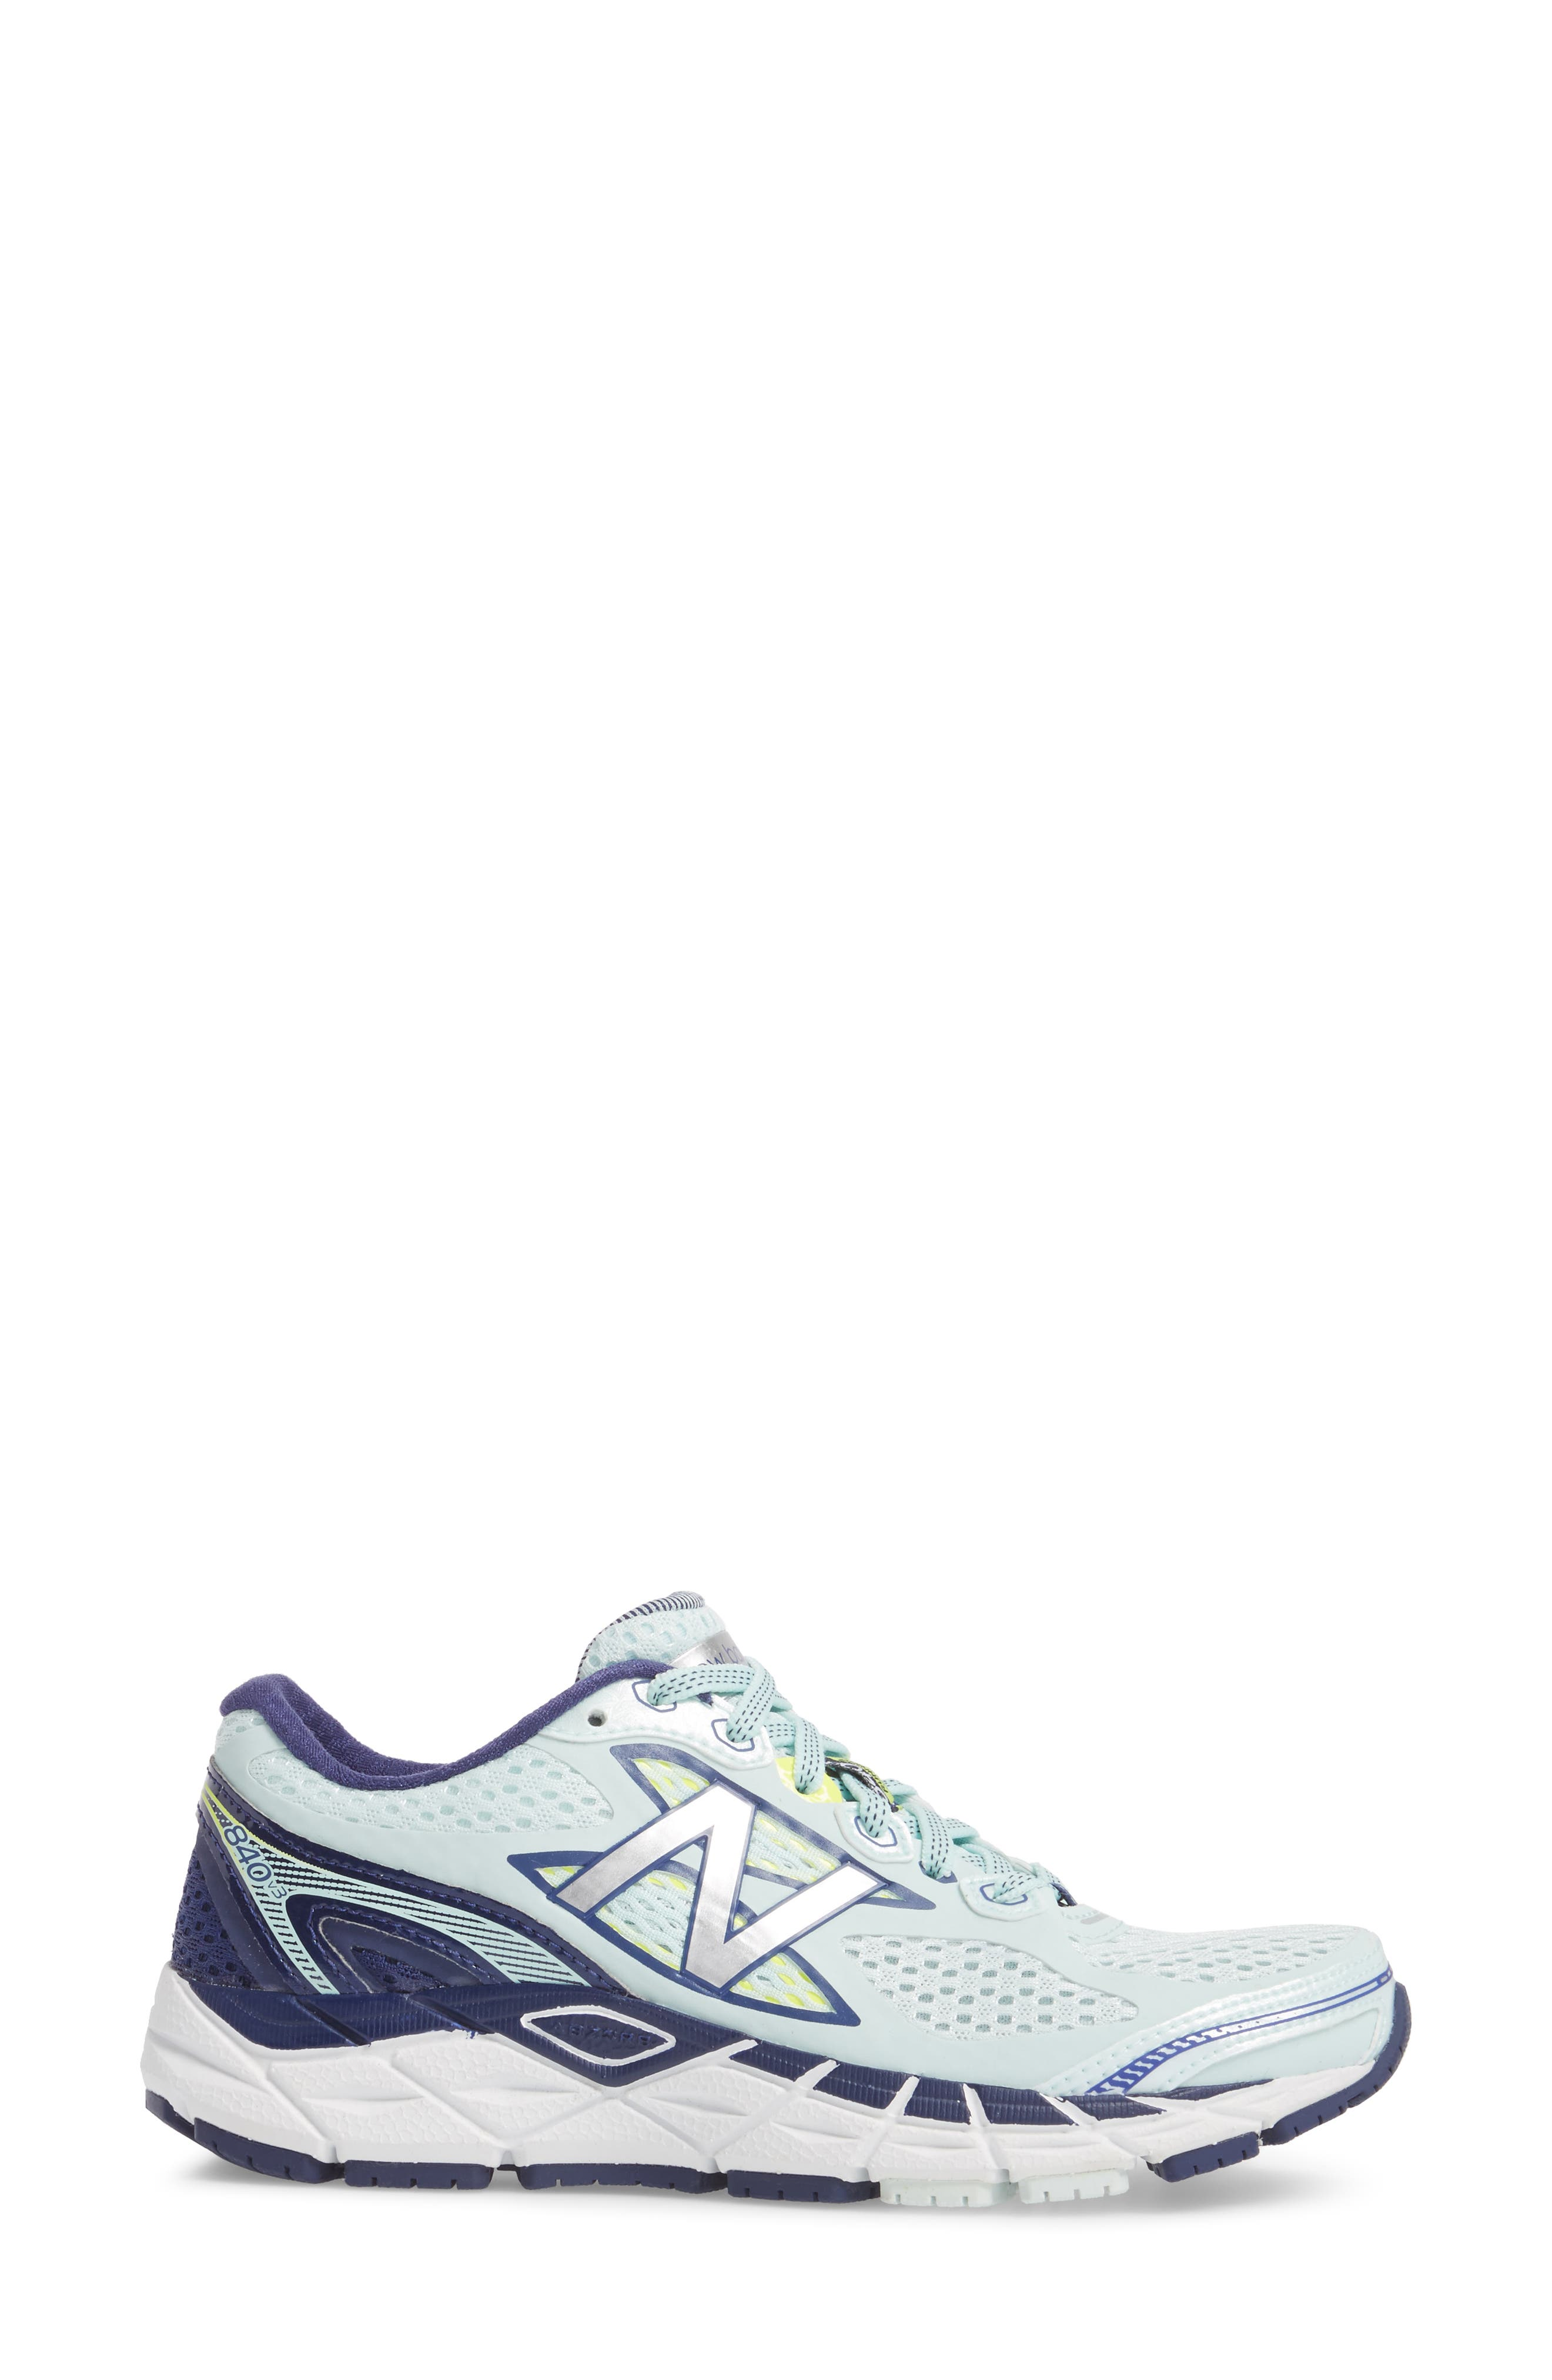 '840v3' Running Shoe,                             Alternate thumbnail 3, color,                             DROPLET